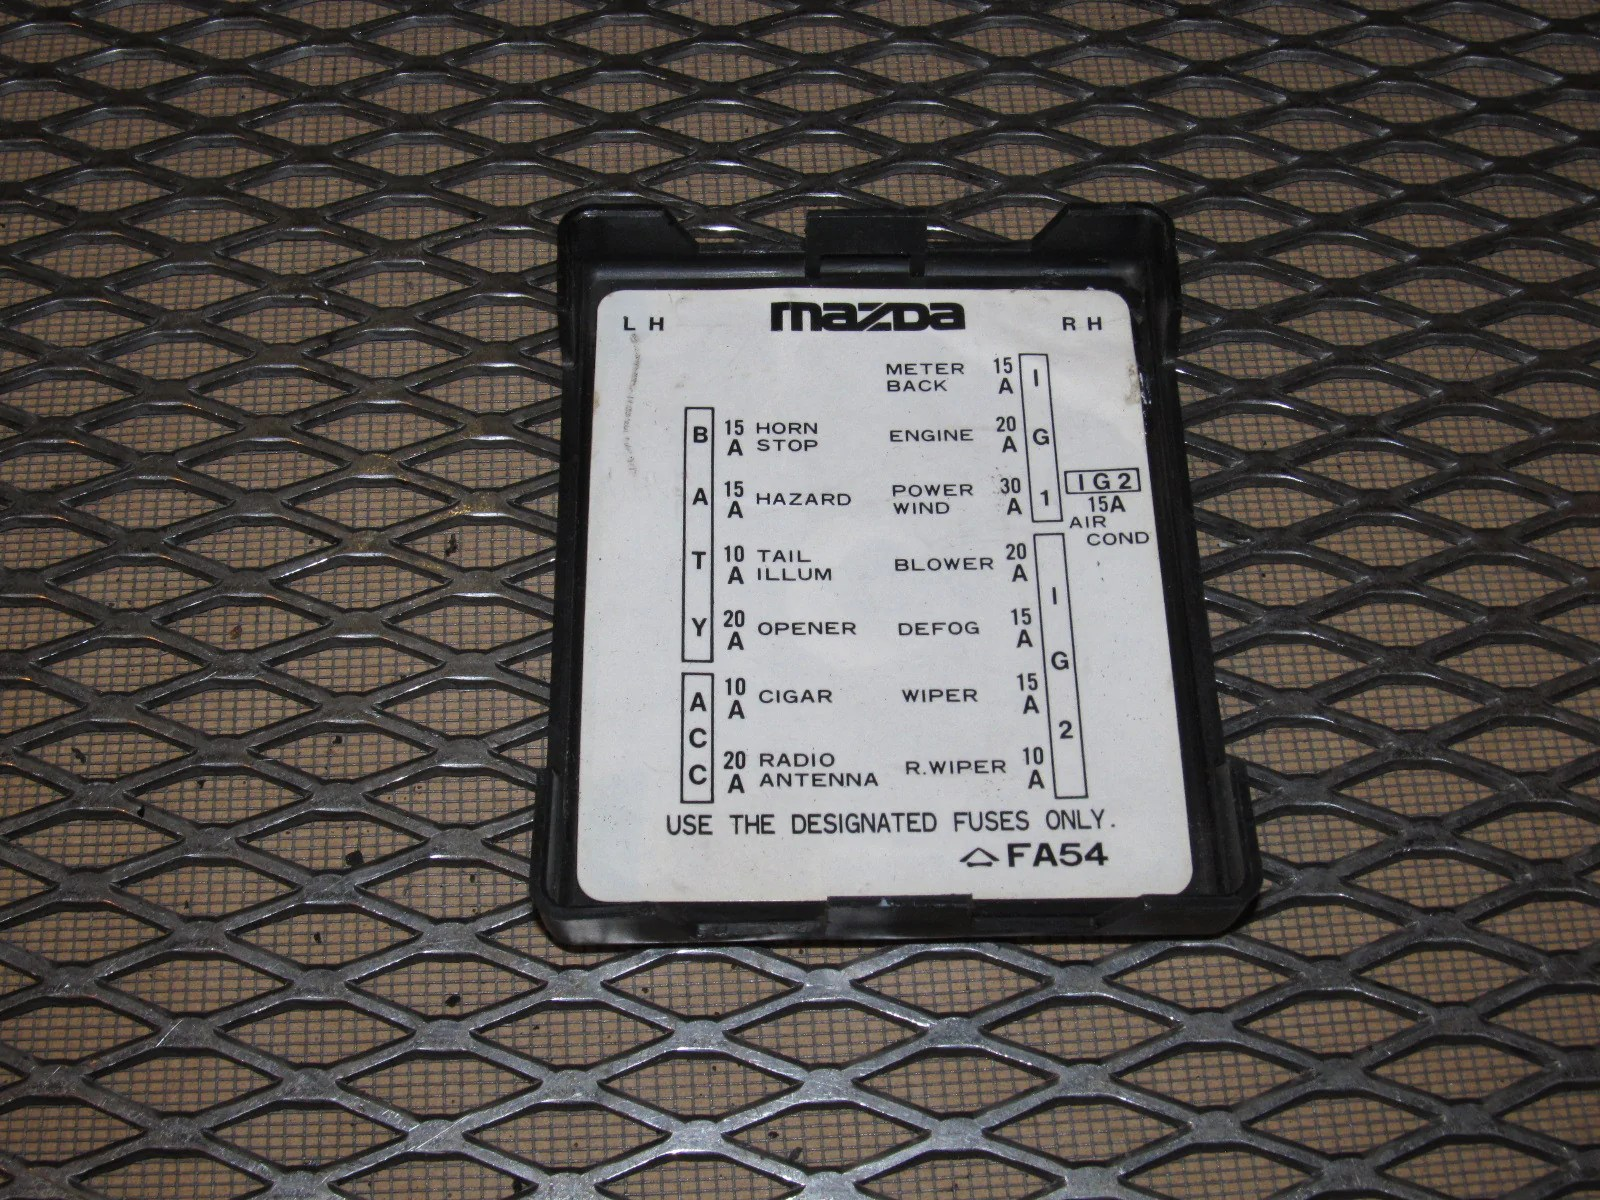 87 rx7 fuse box wiring library rh 28 skriptoase de 87 monte carlo ss 87 monte carlo ss [ 1600 x 1200 Pixel ]